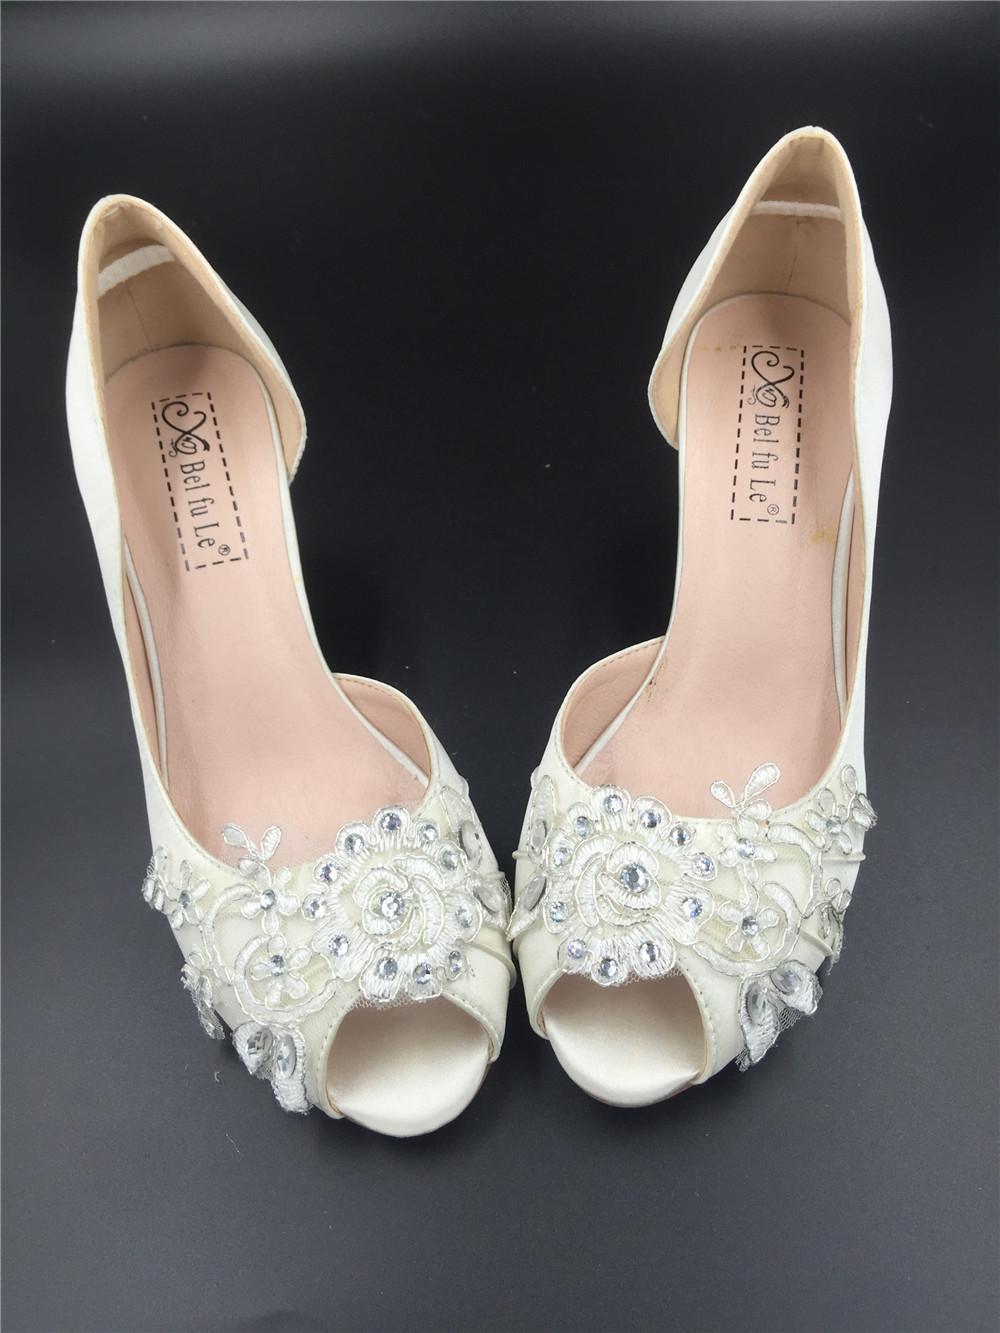 Ivory White Bridal Shoes,Lace Satin Wedding heels Shoes,Pump,Peep Toe Heels